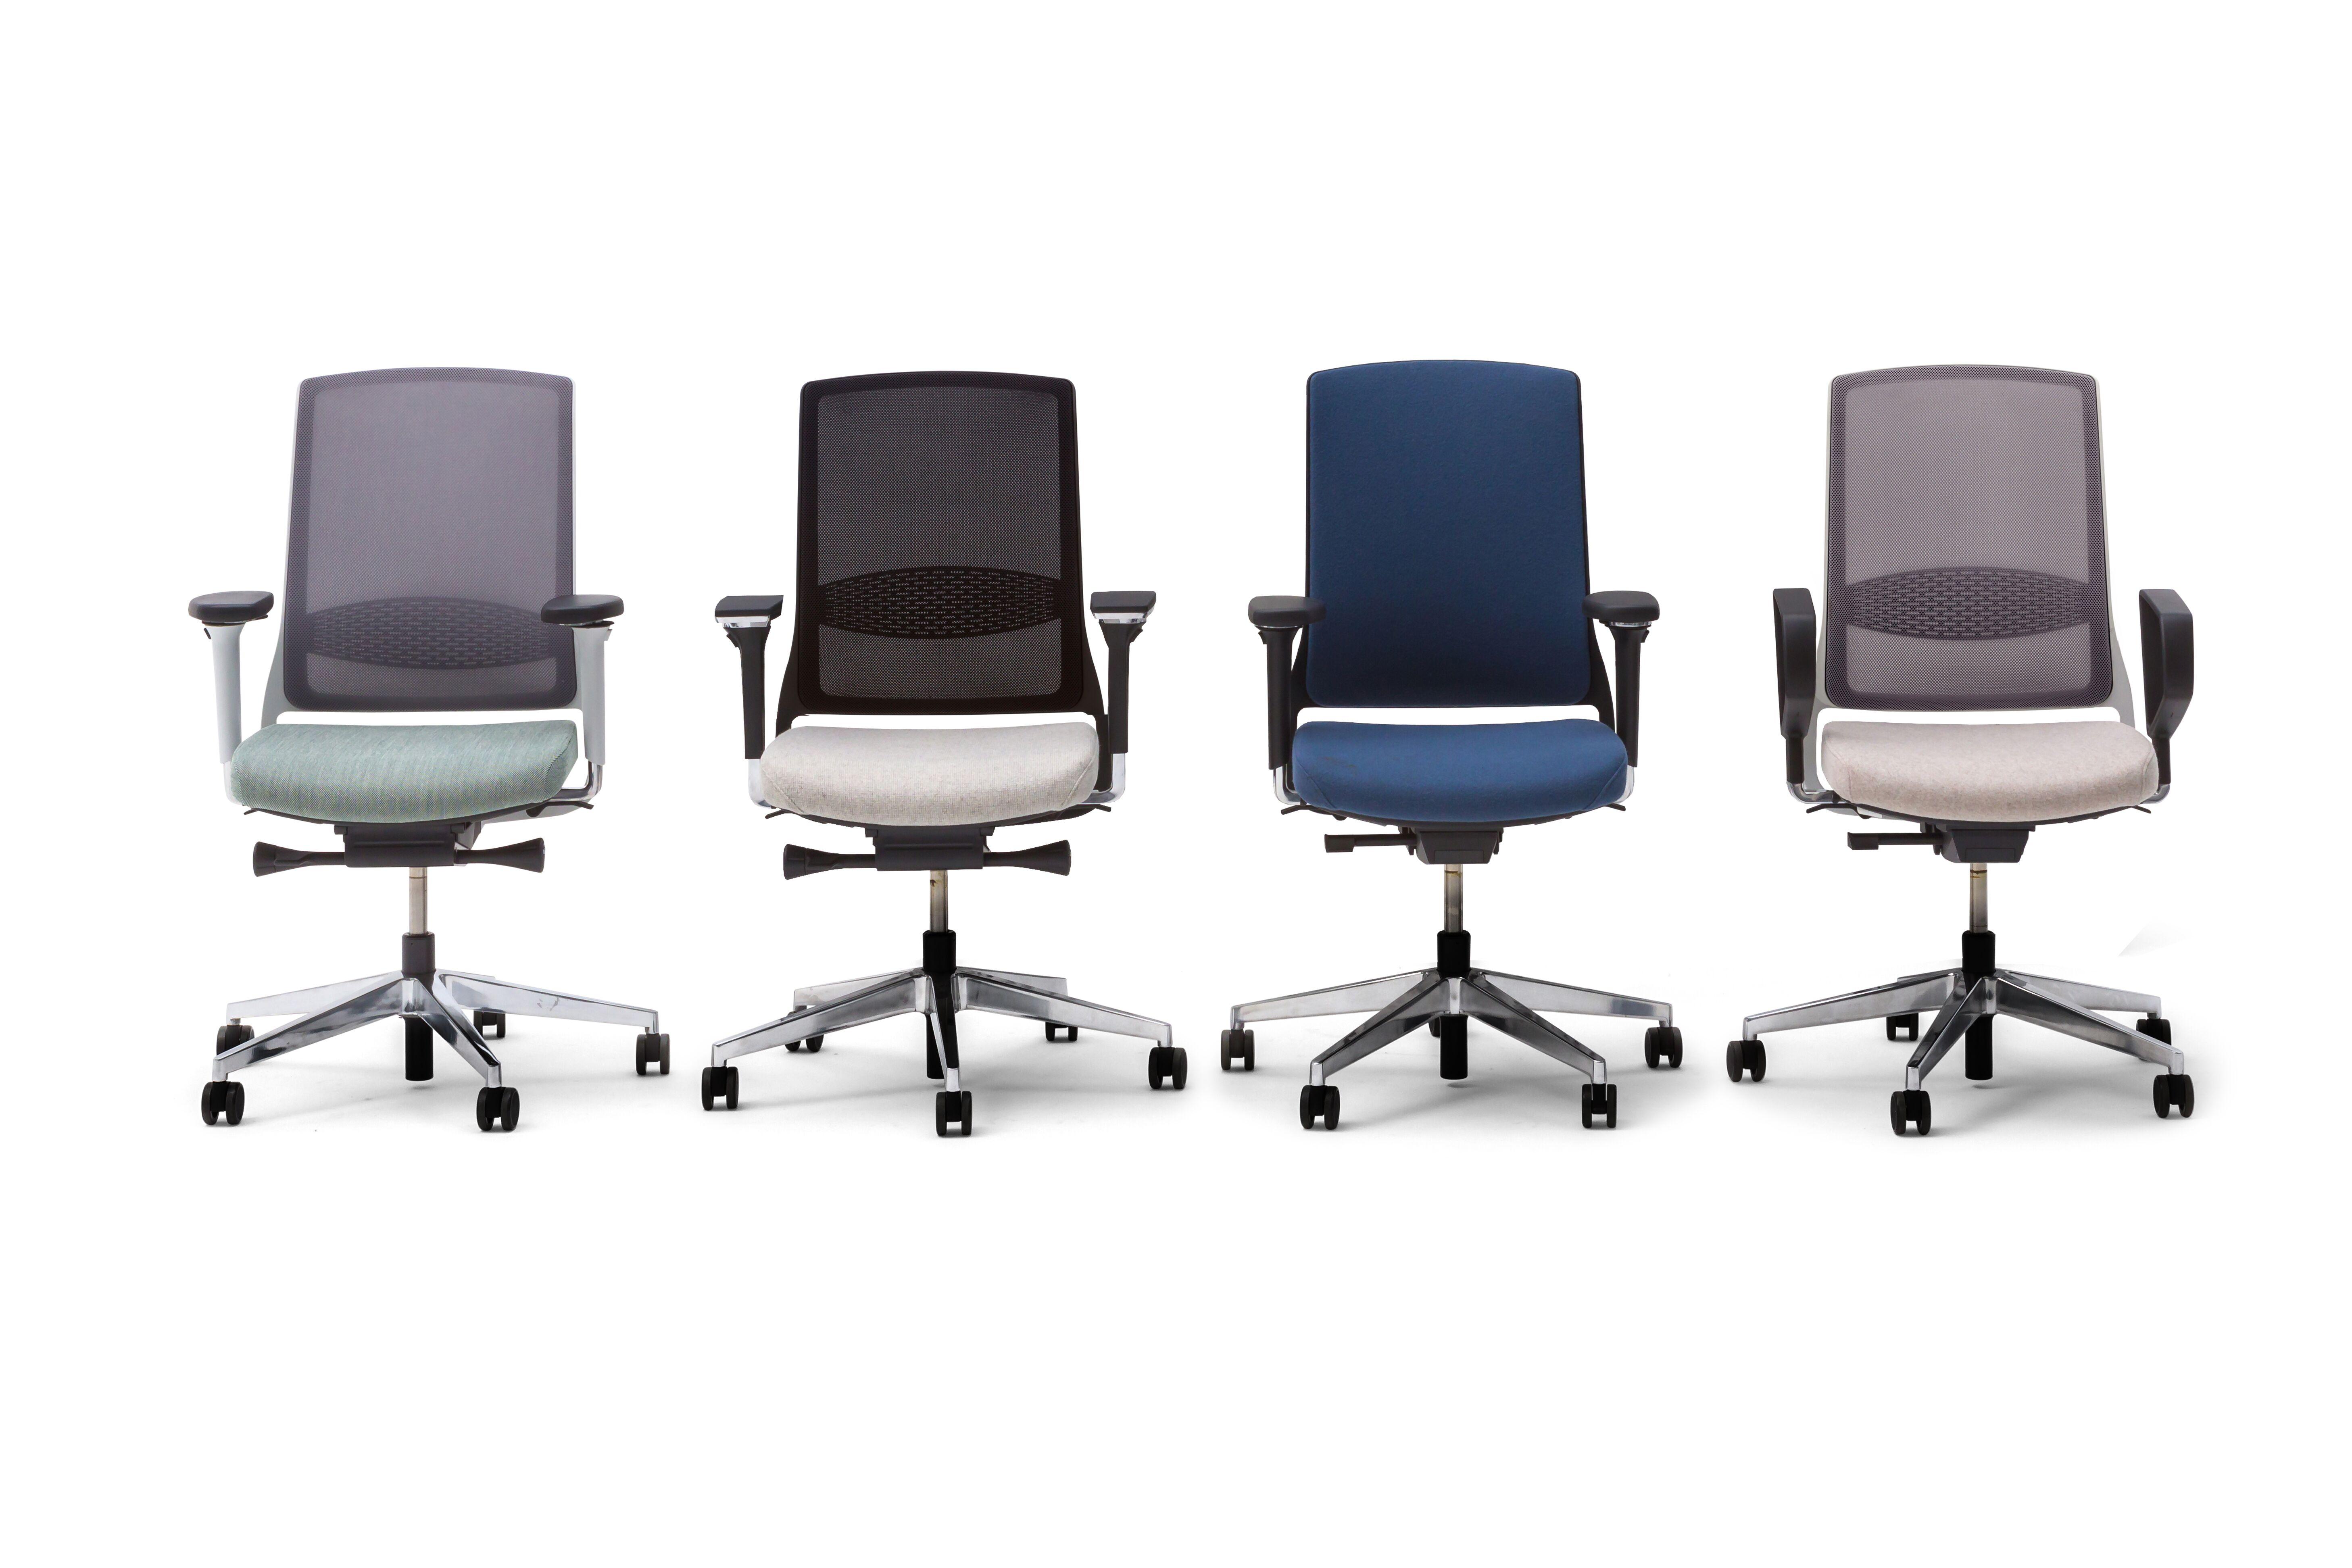 Gispen Zinn office chairs front view